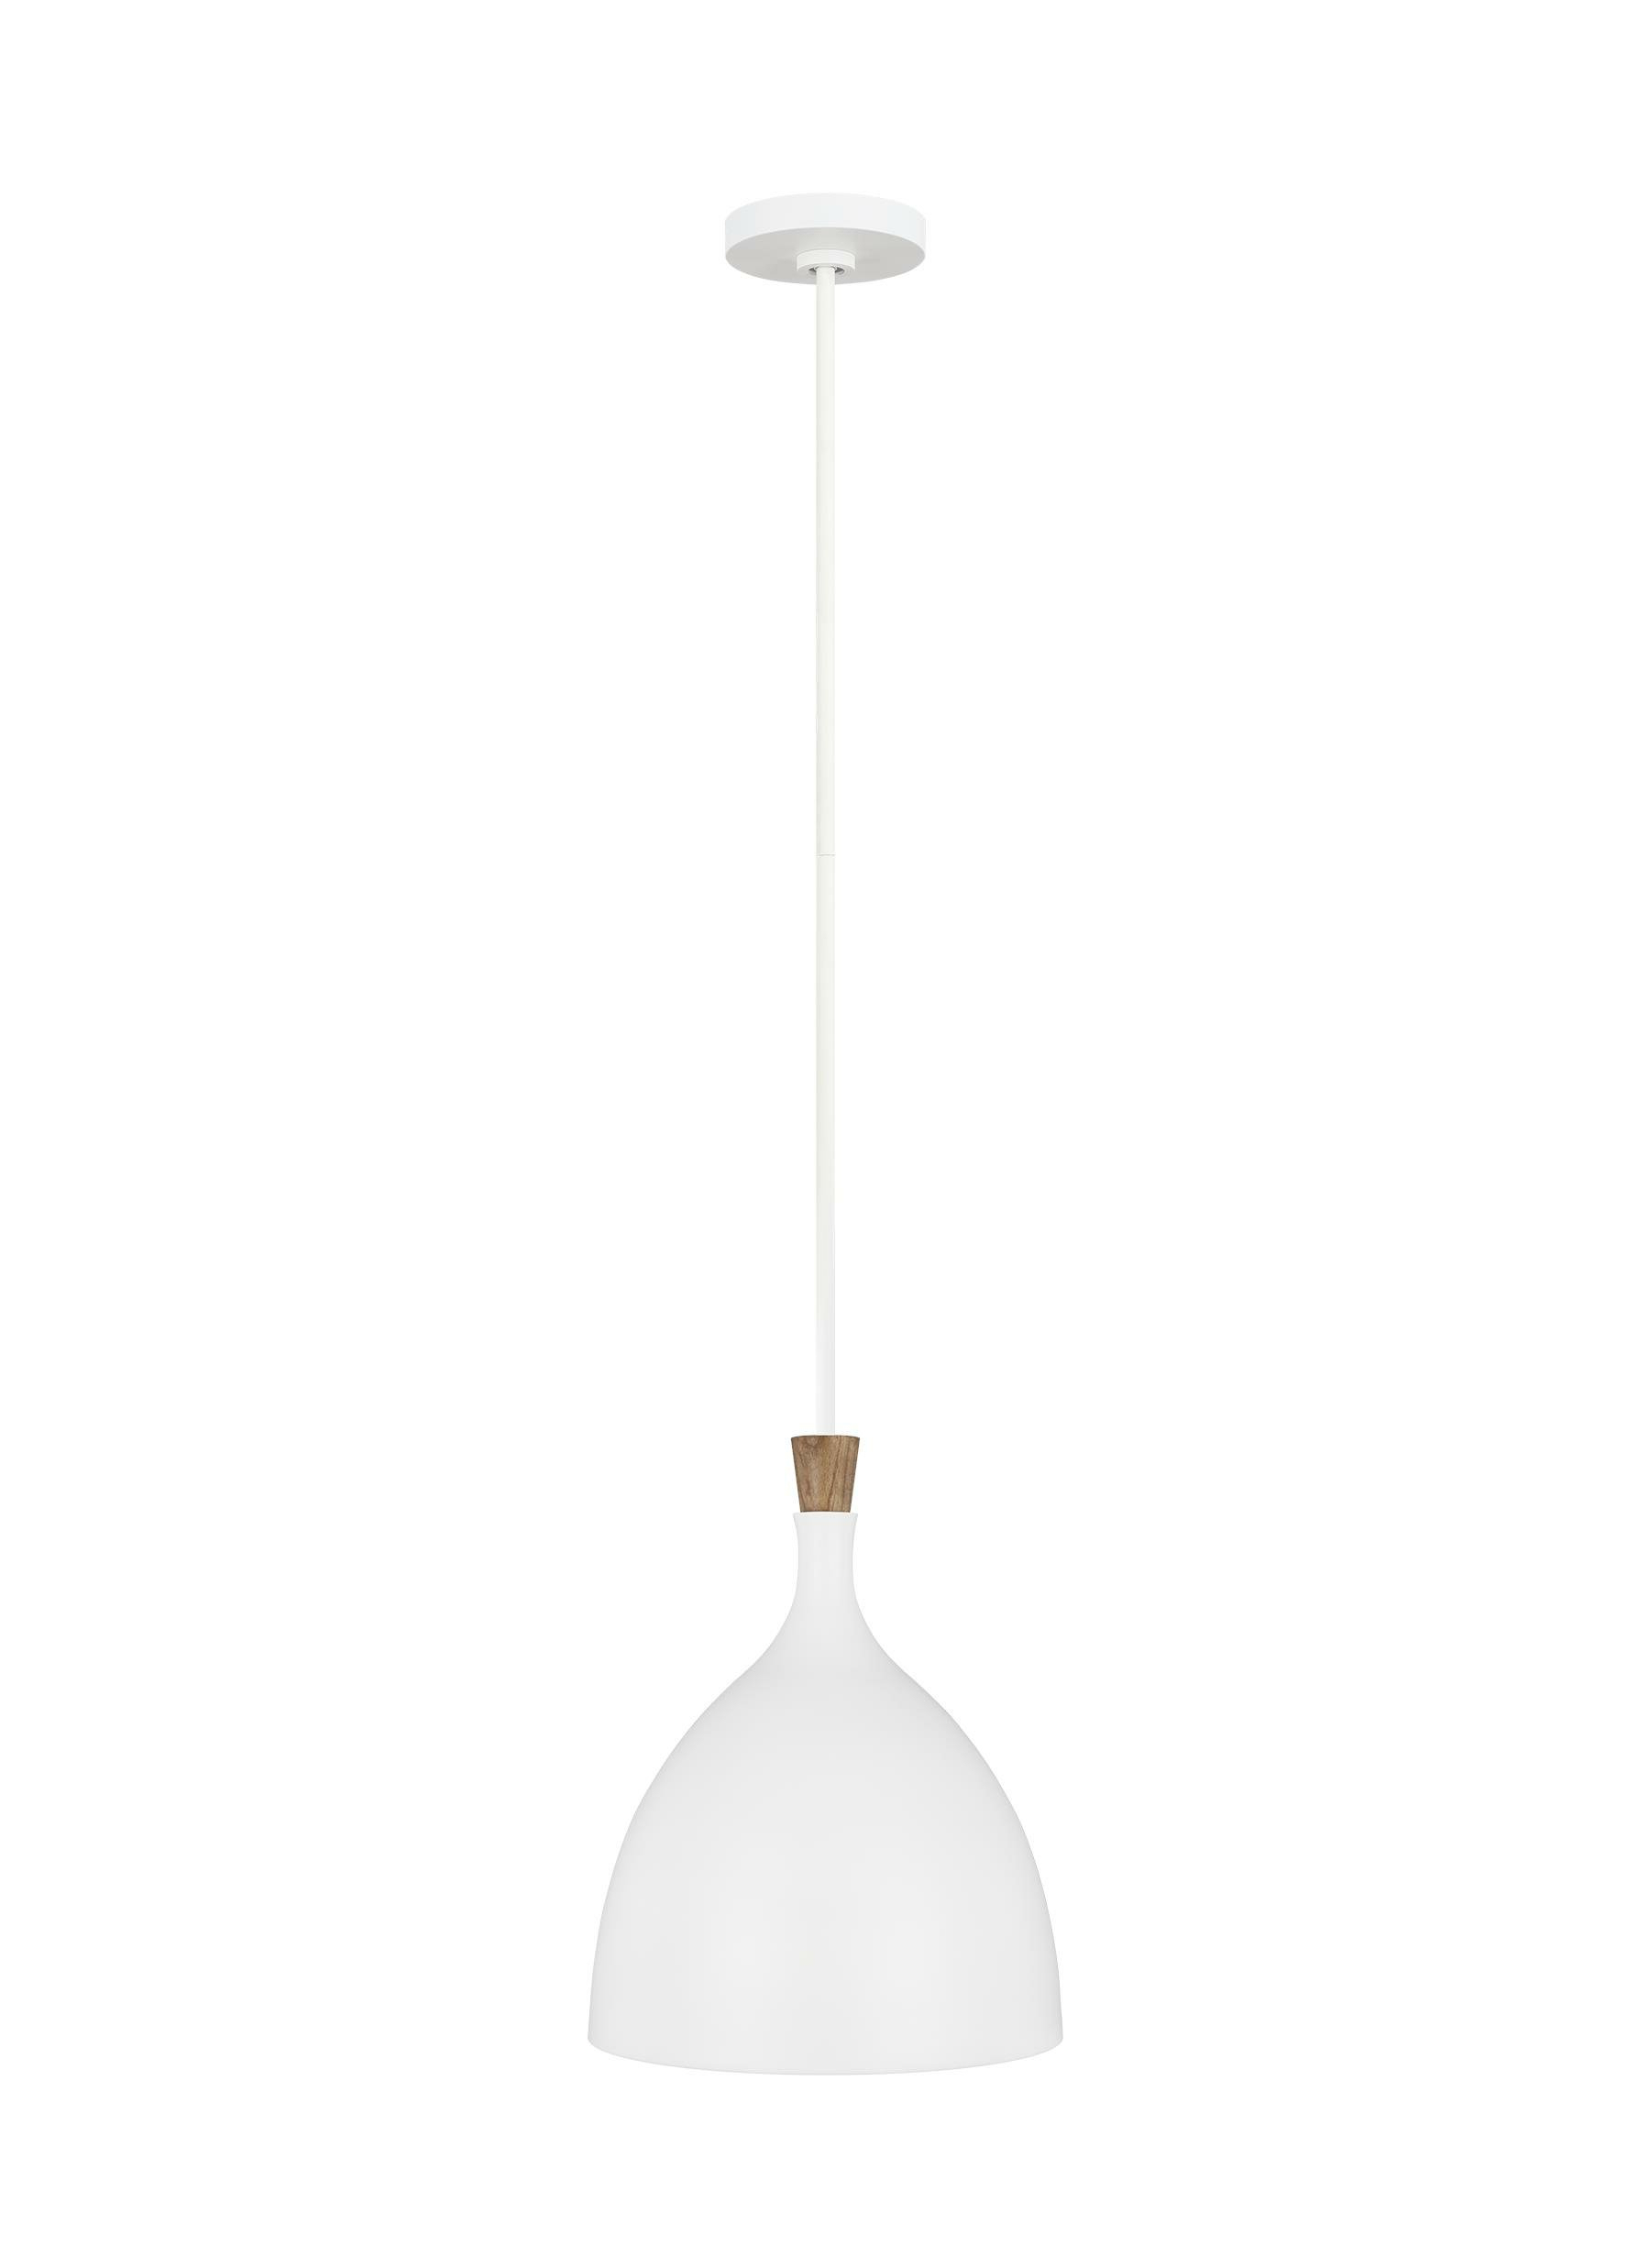 2020 Monadnock 1 Light Single Dome Pendants In Darwin 1 Light Single Dome Pendant (Gallery 19 of 20)